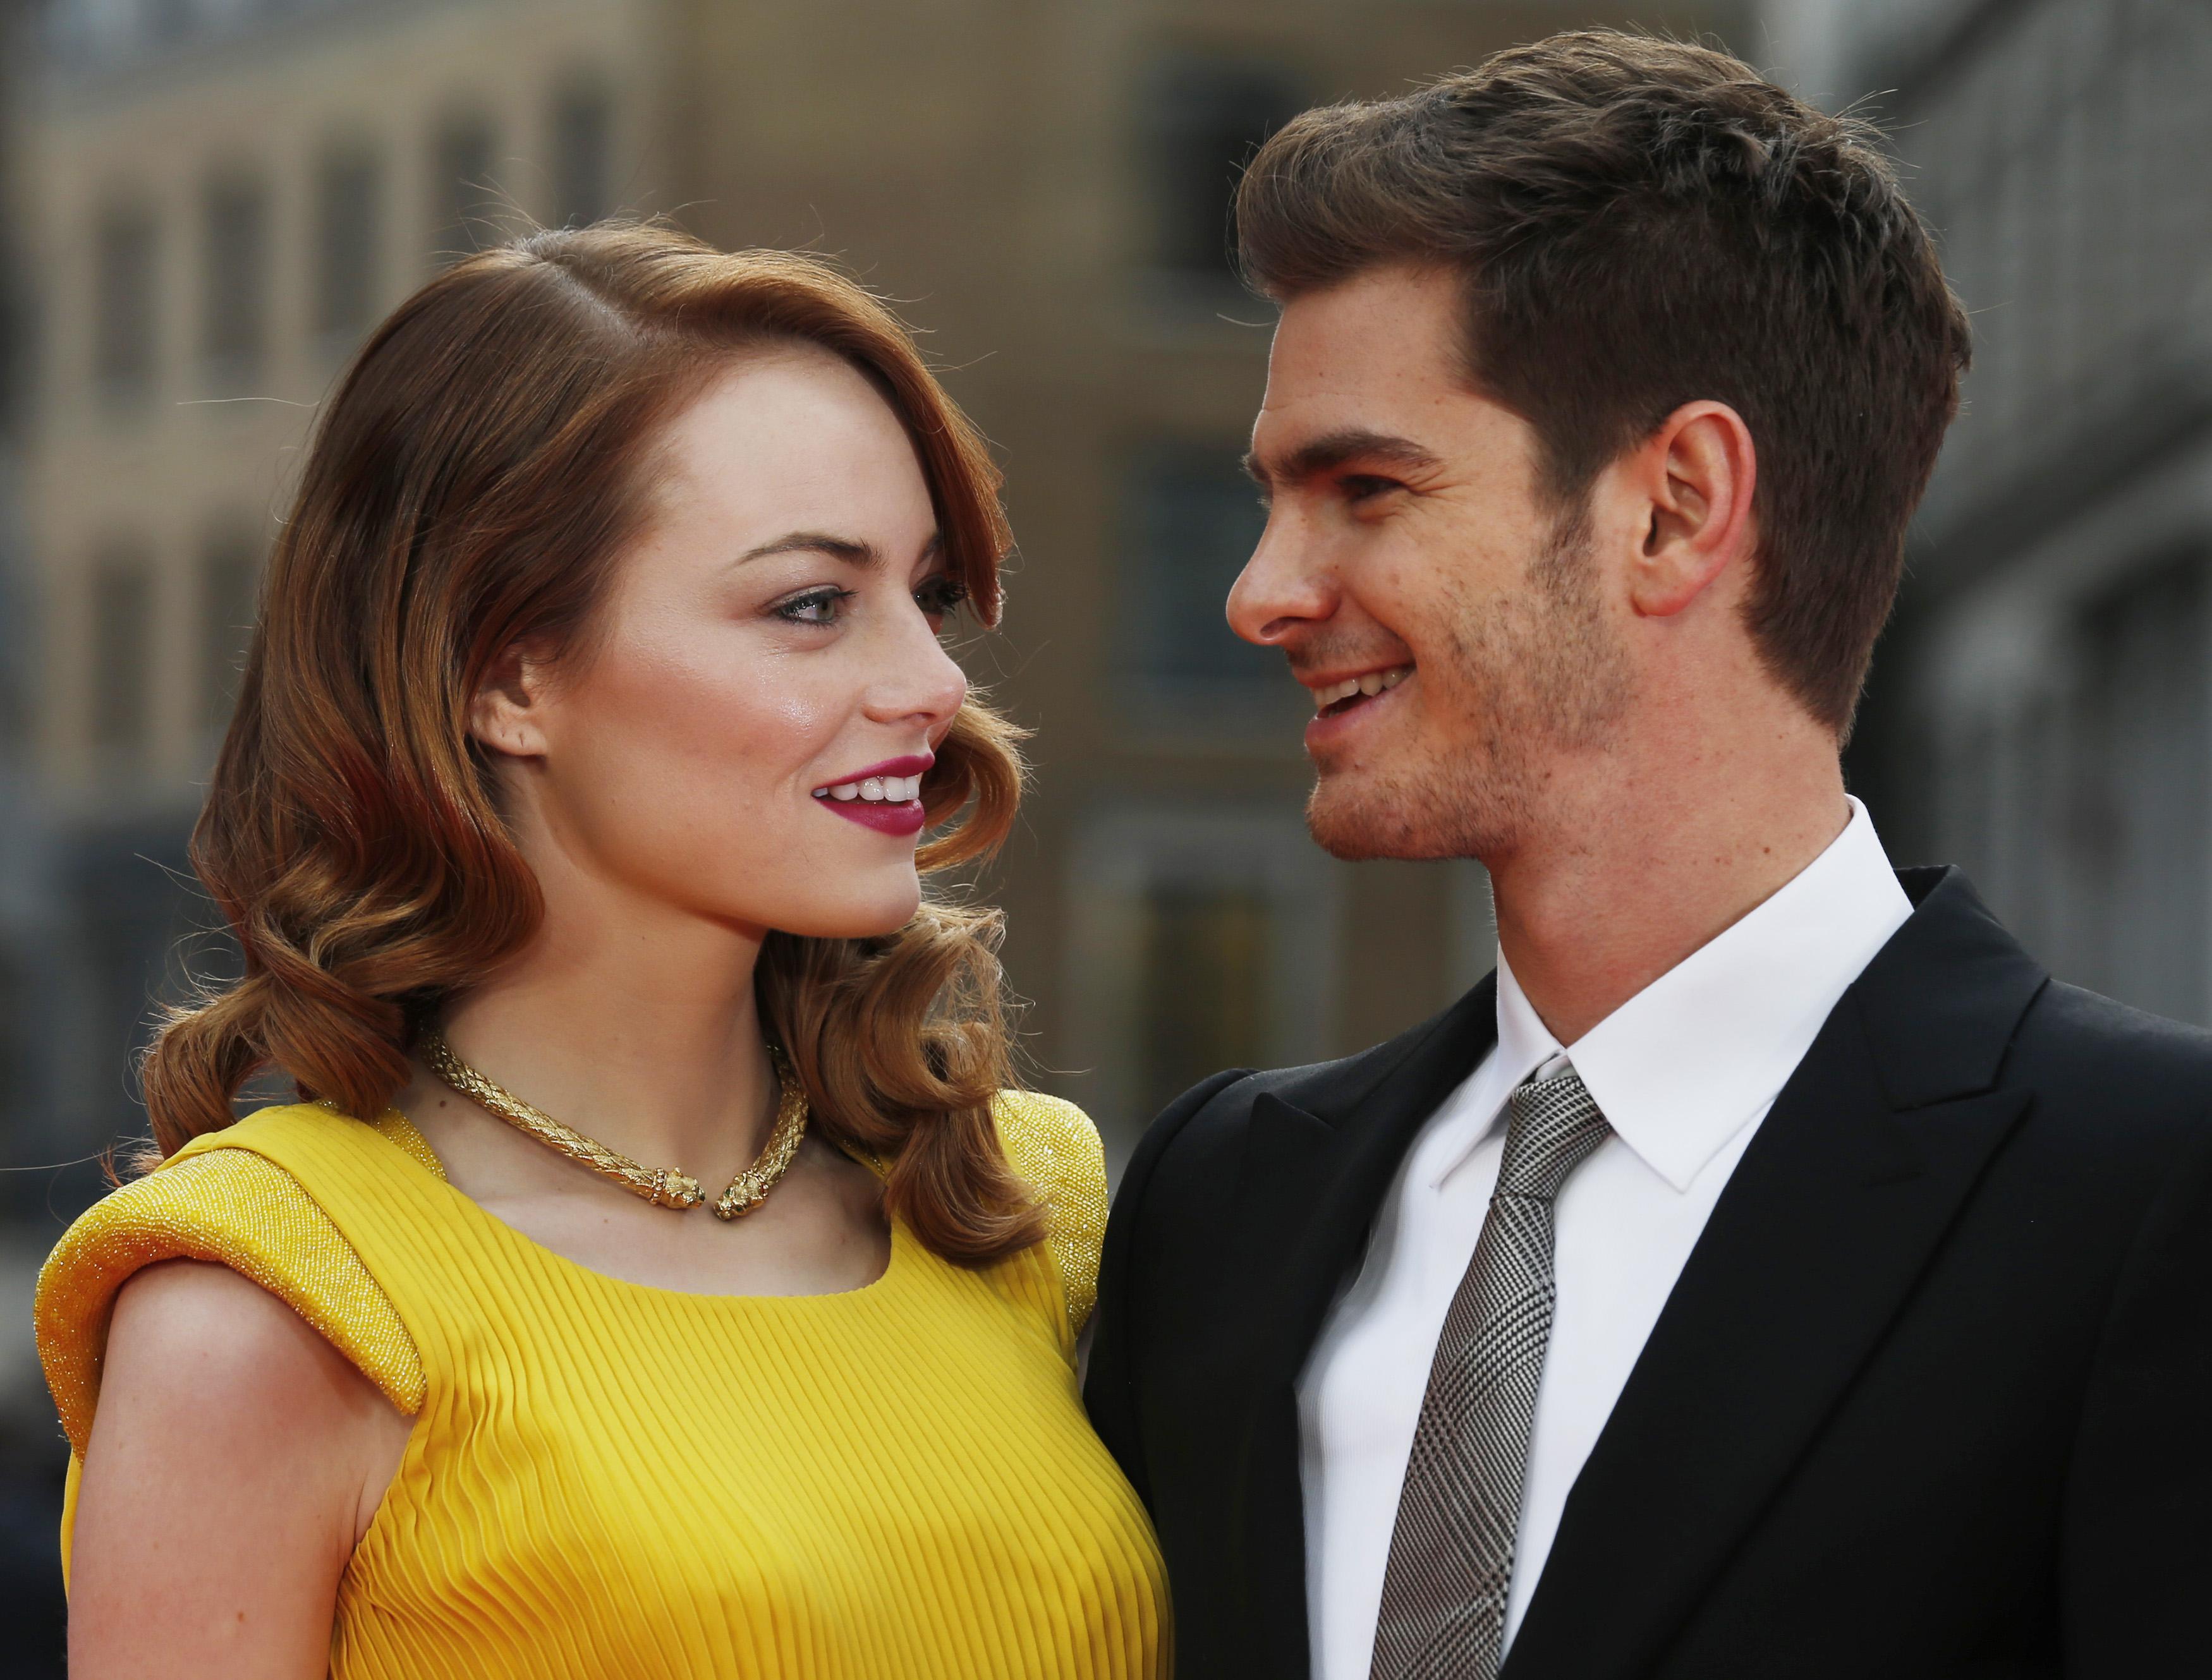 эндрю гарфилд и эмма стоун свадьба фото самого пруда